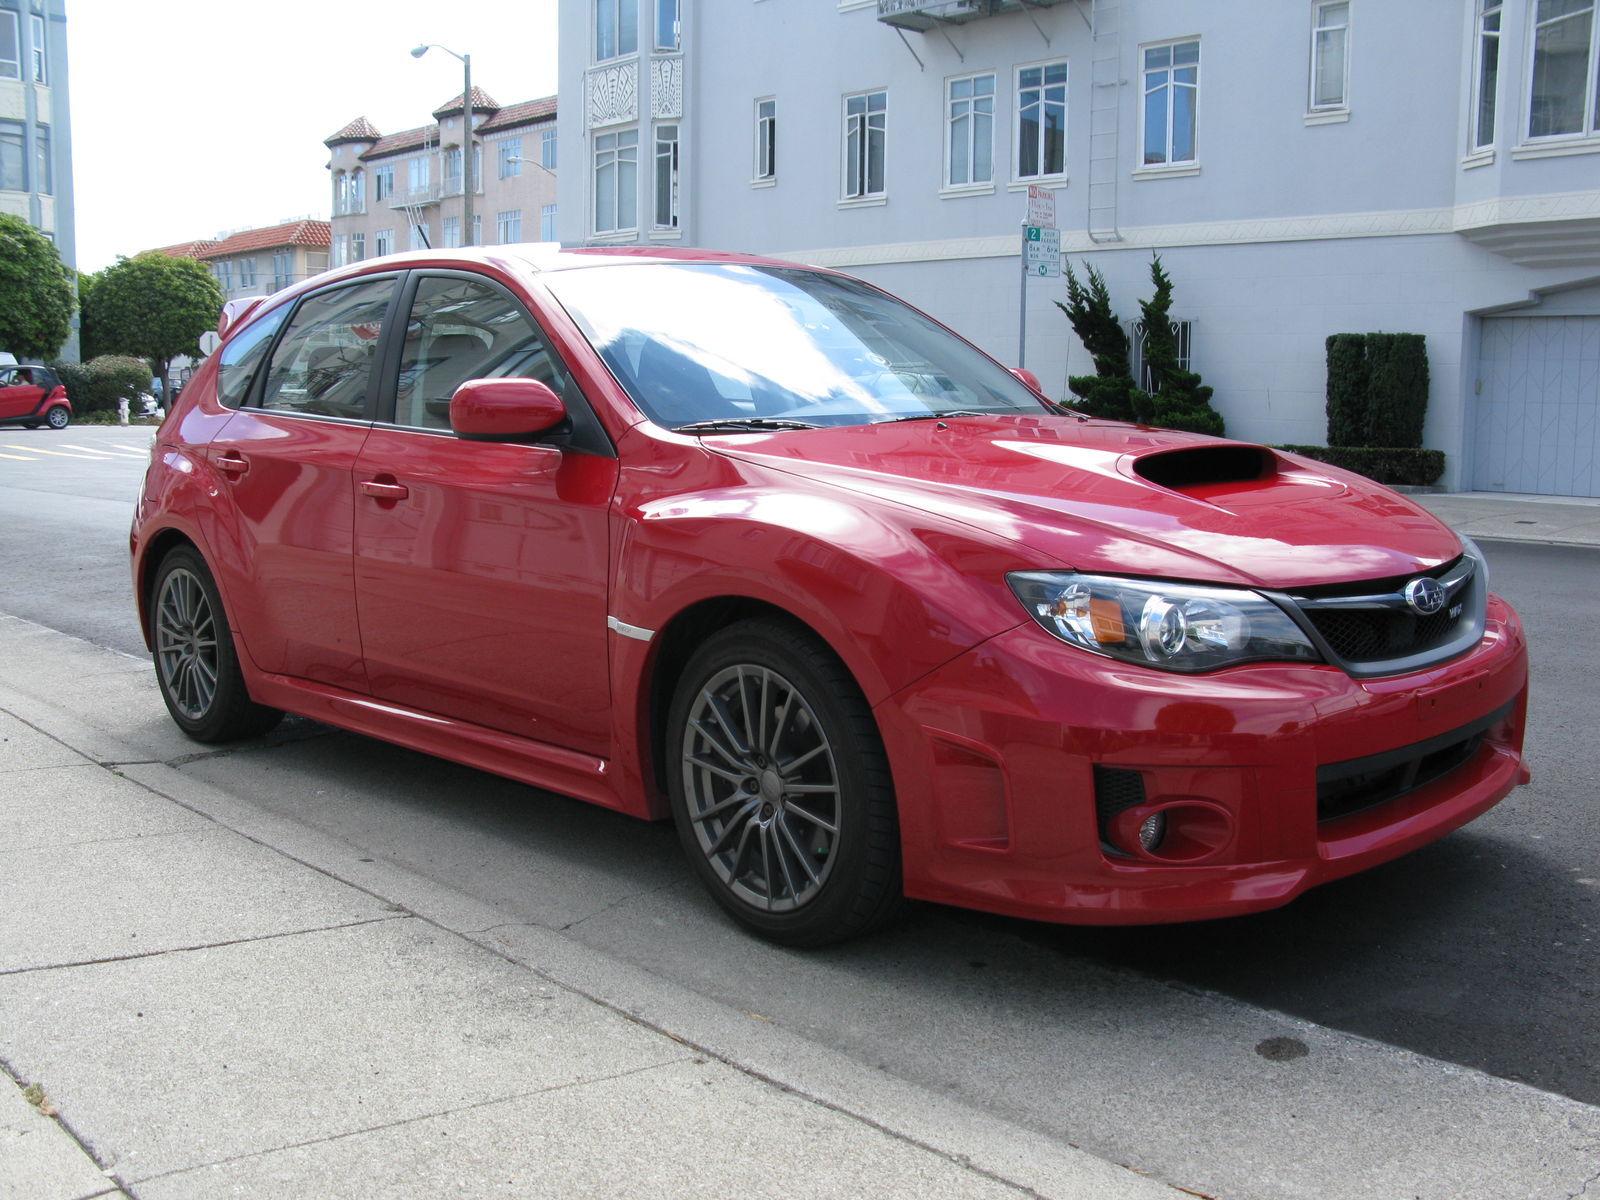 2011 Subaru WRX | 2011 Subaru WRX For Sale